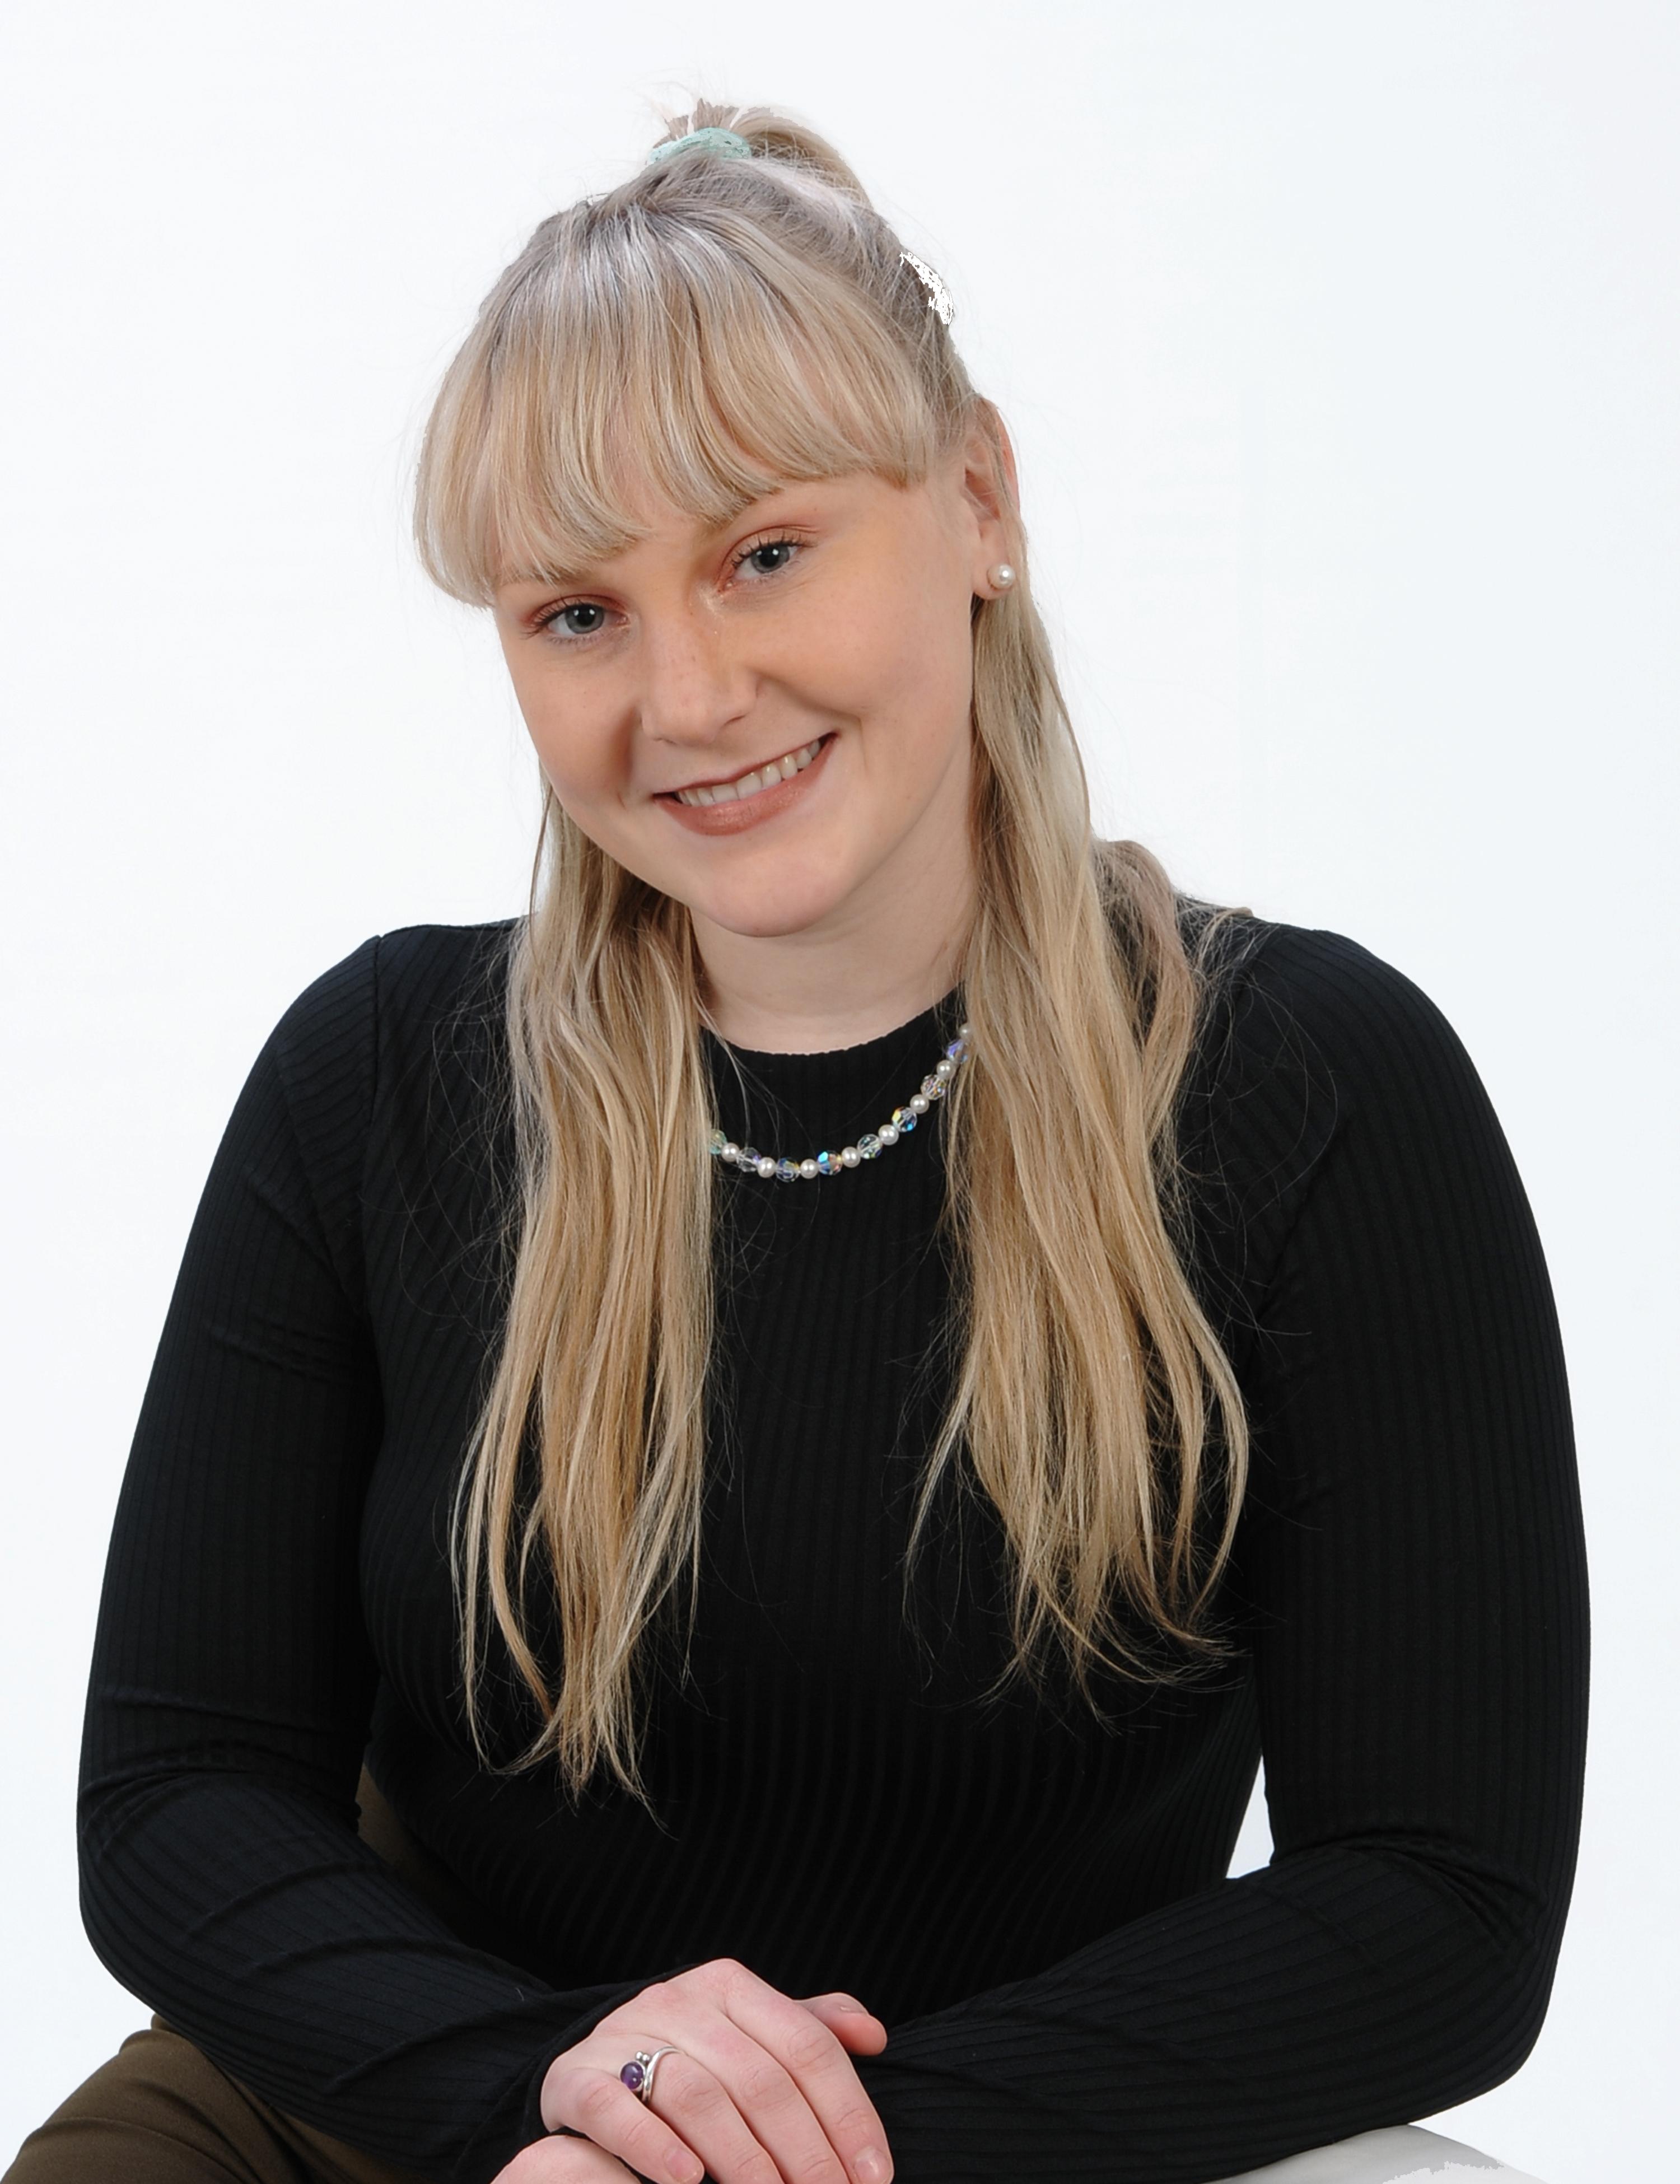 Courtney Sagun | Receptionist and Client Service Administrator